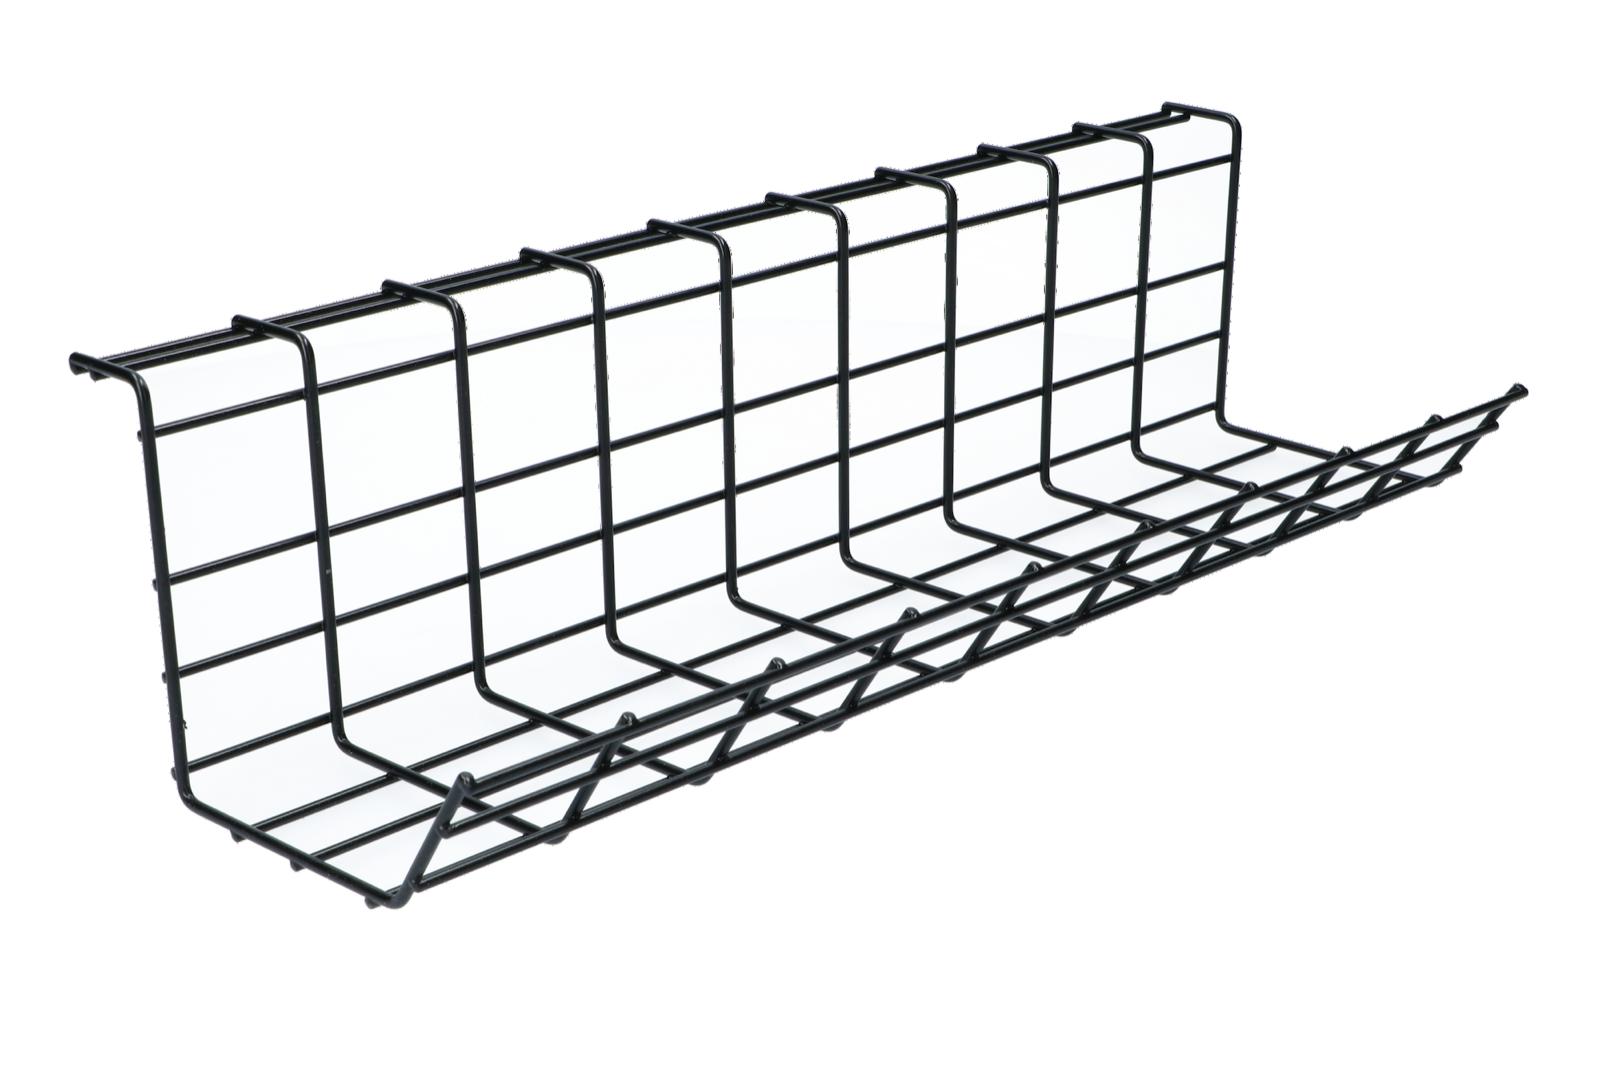 UNDER DESK CABLE ORGANIZER TRAY WIRE MANAGEMENT DESK CABLE RACK - BLACK